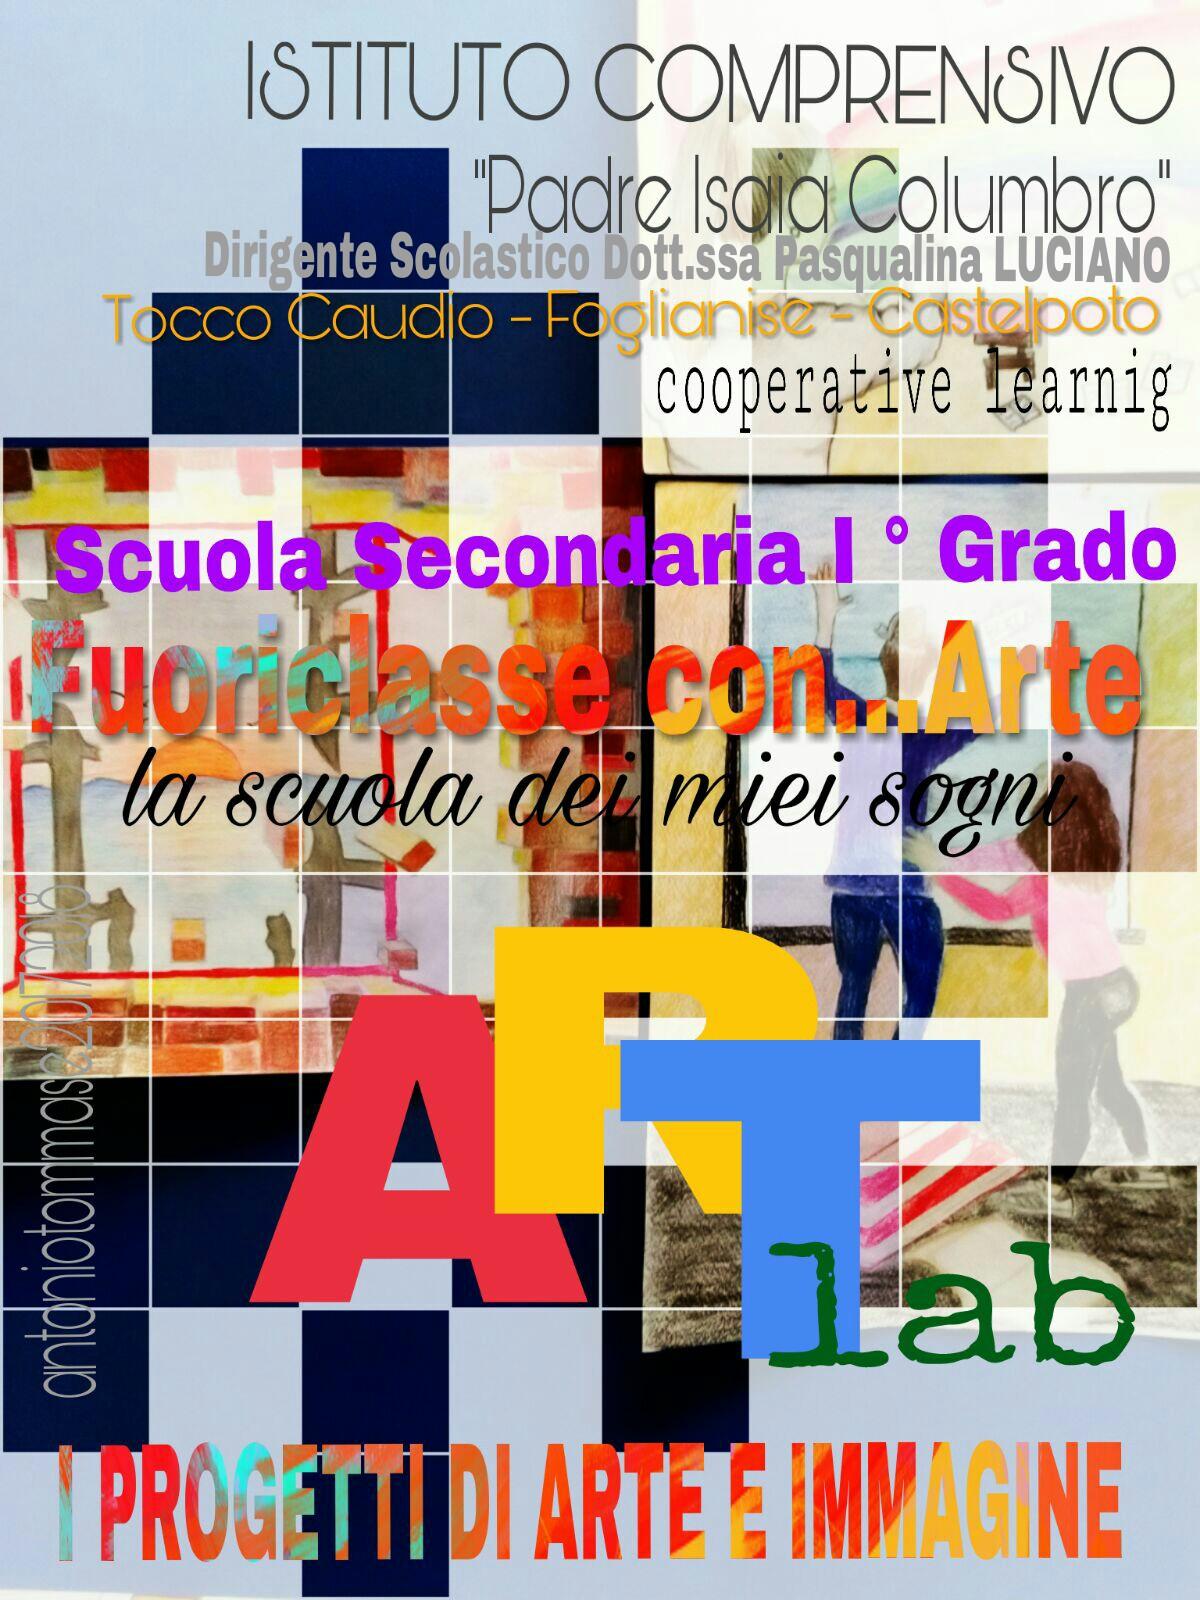 I Progetti Di Arte E Immagine Website Wwwicfoglianisegovit